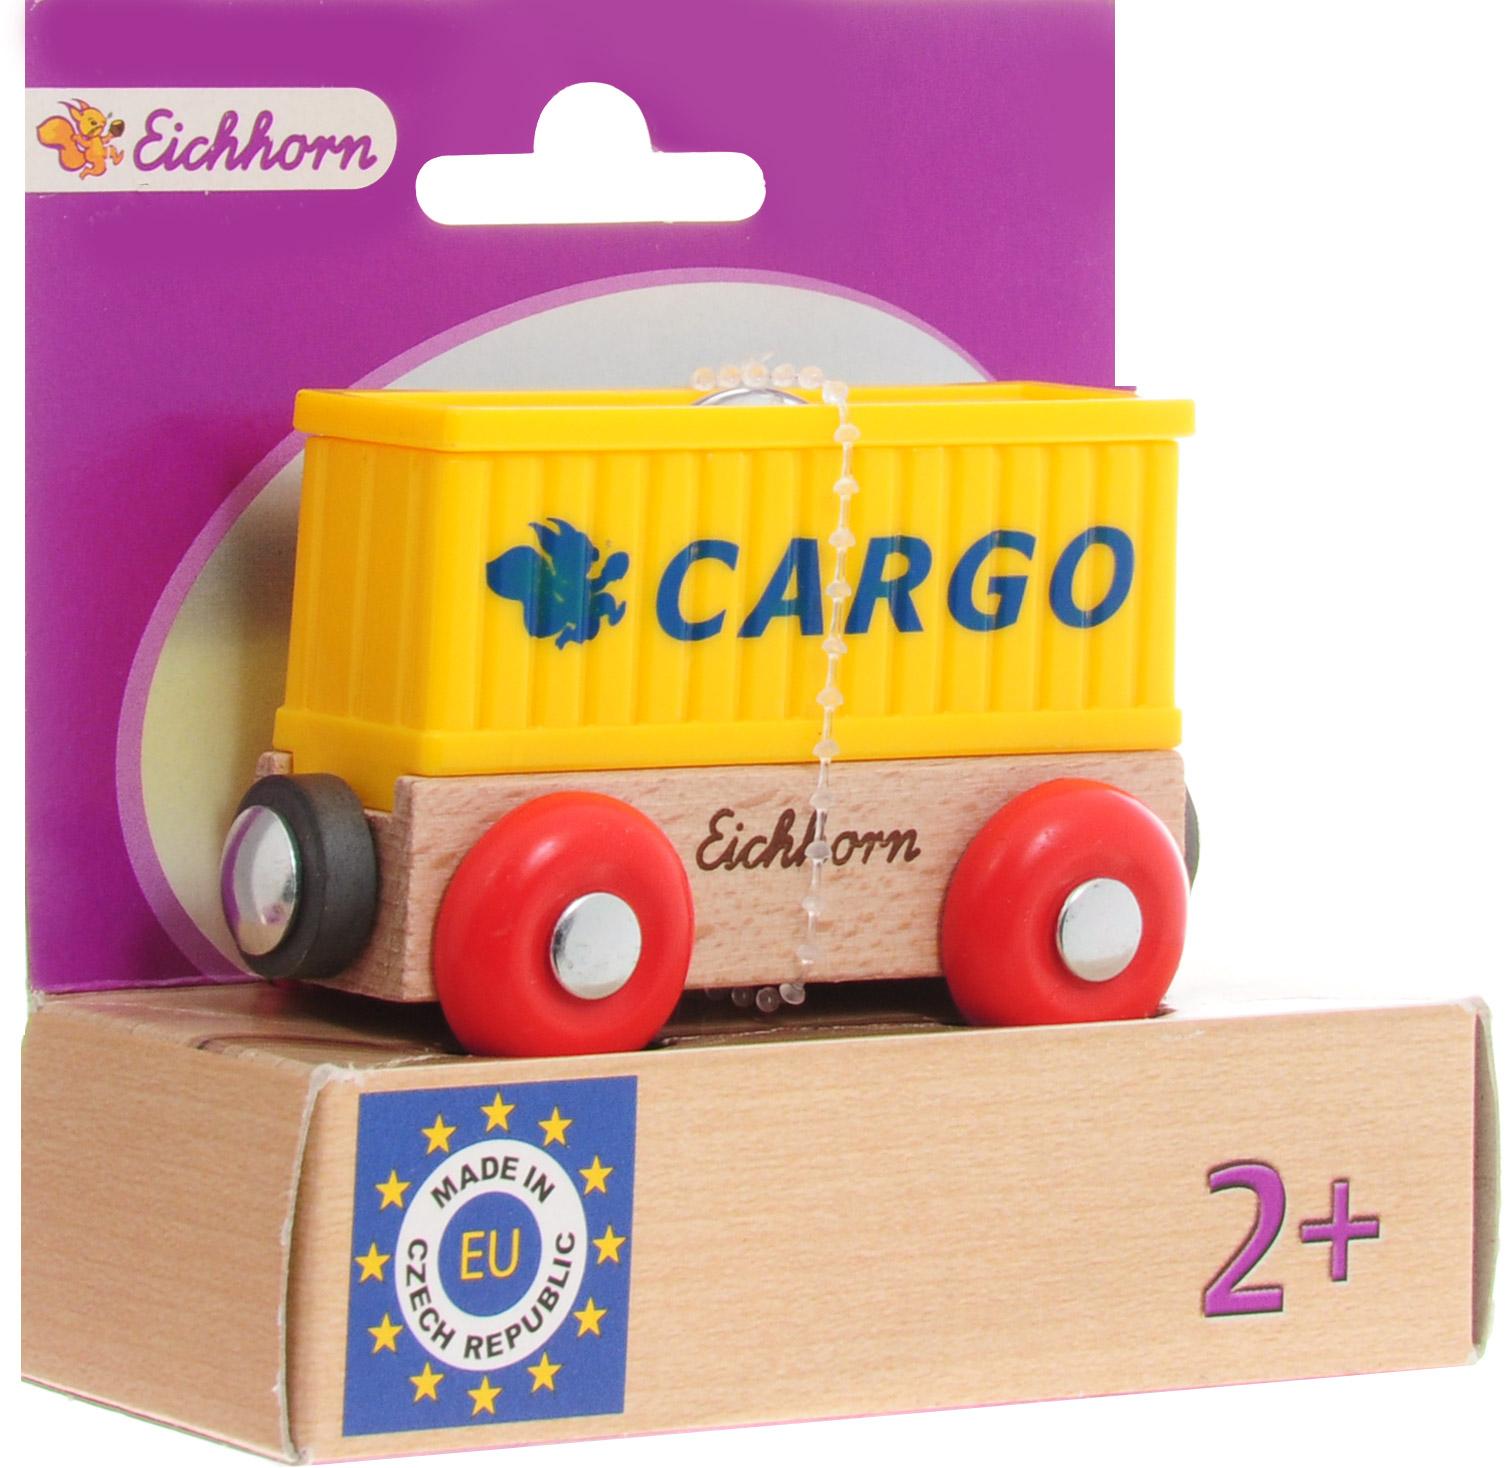 Eichhorn Вагон-контейнер Cargo